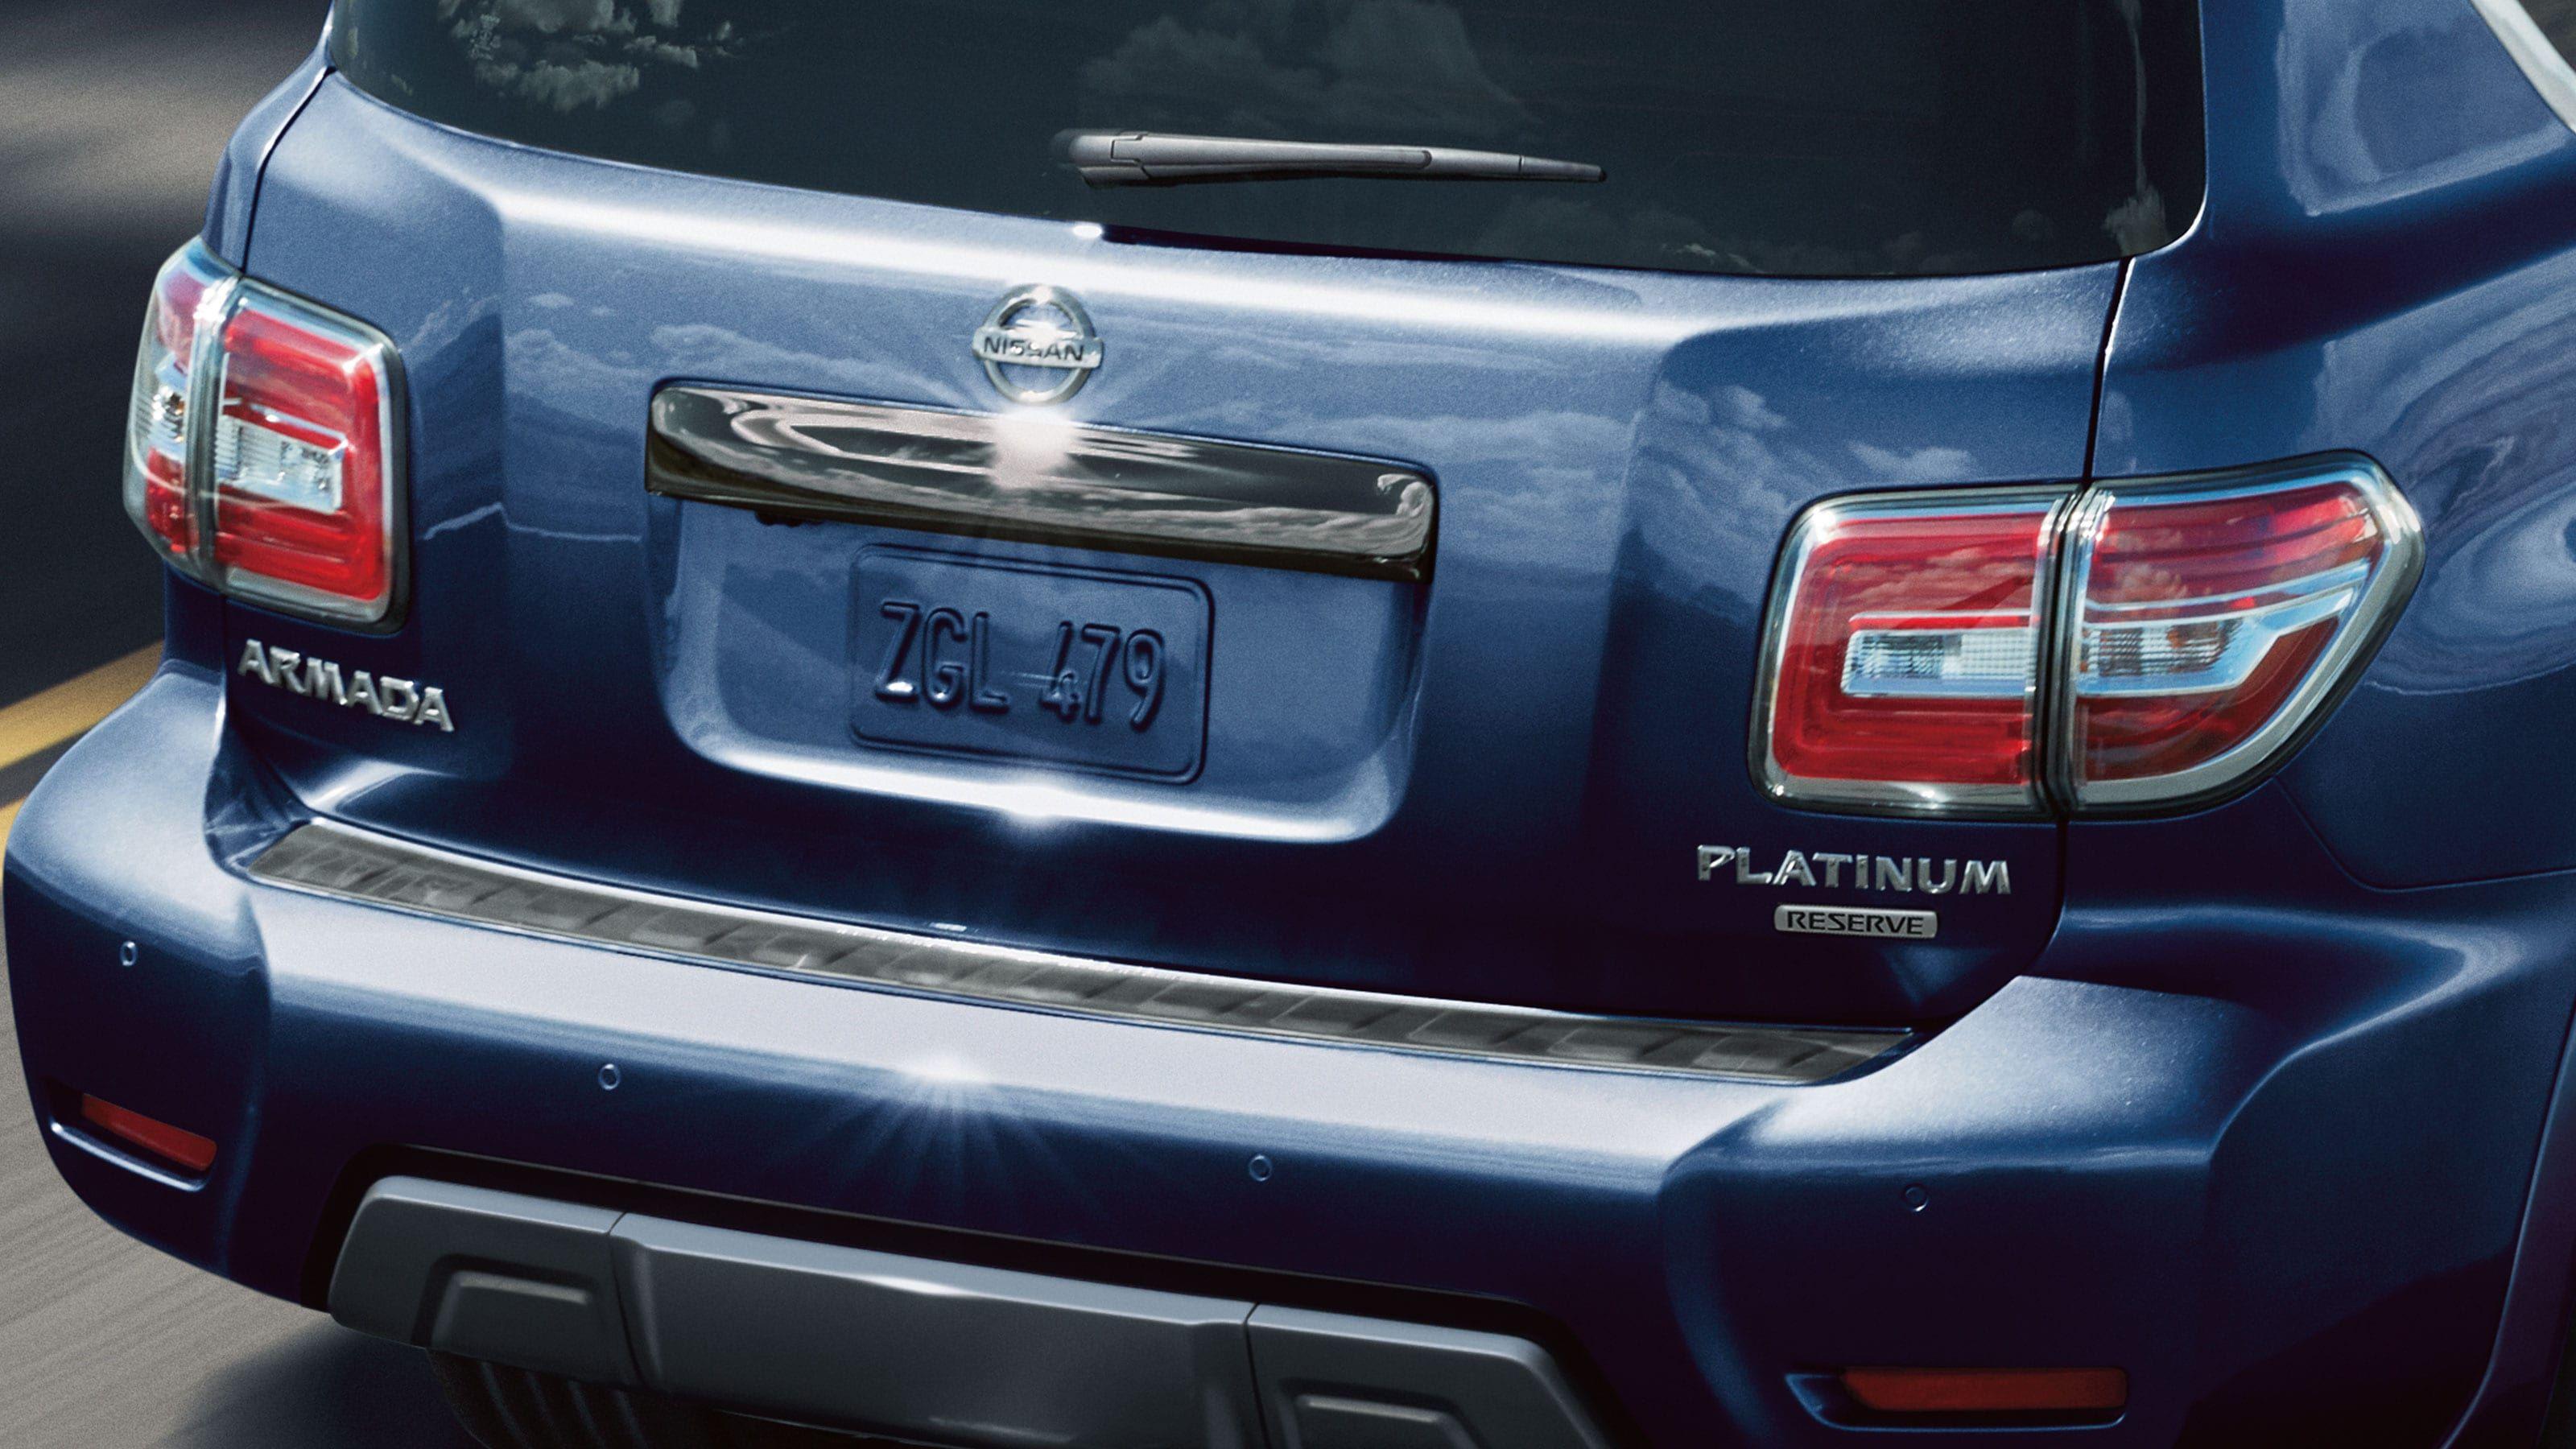 Console In 2020 Nissan Armada Armada Nissan